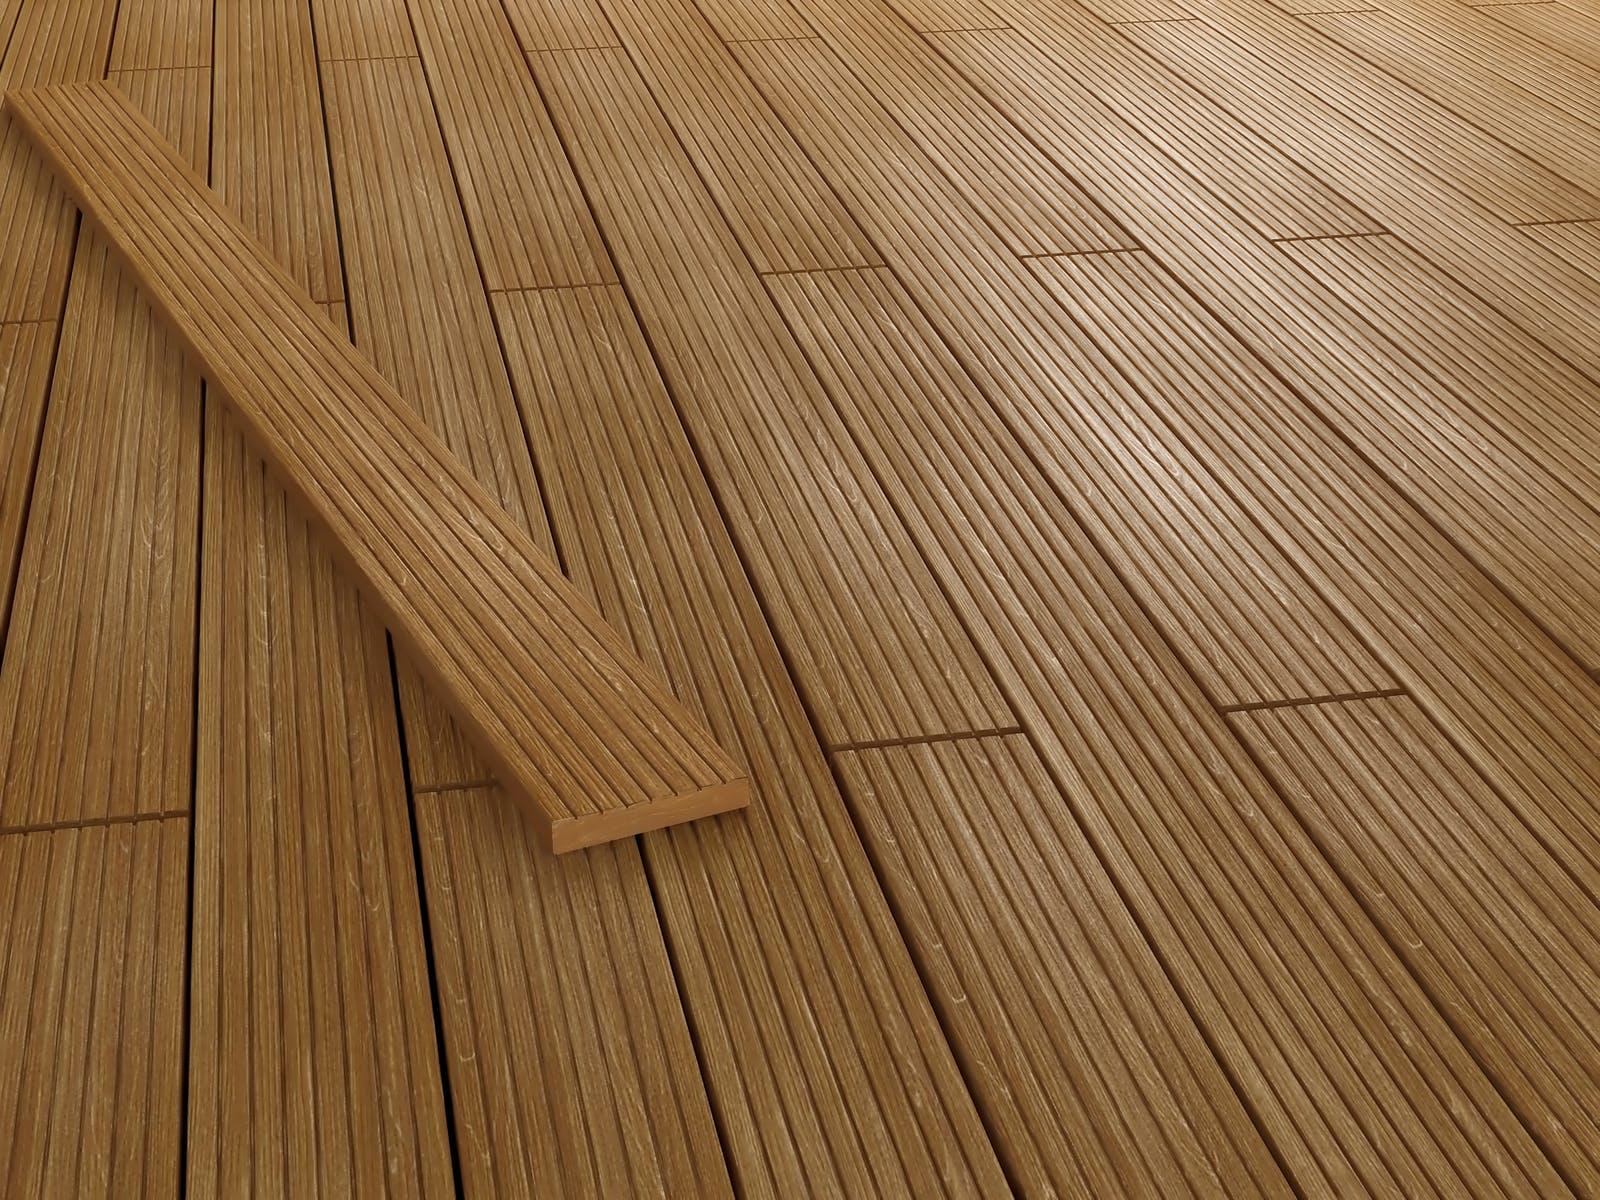 terrassen le holz hartholz bangkirai obi